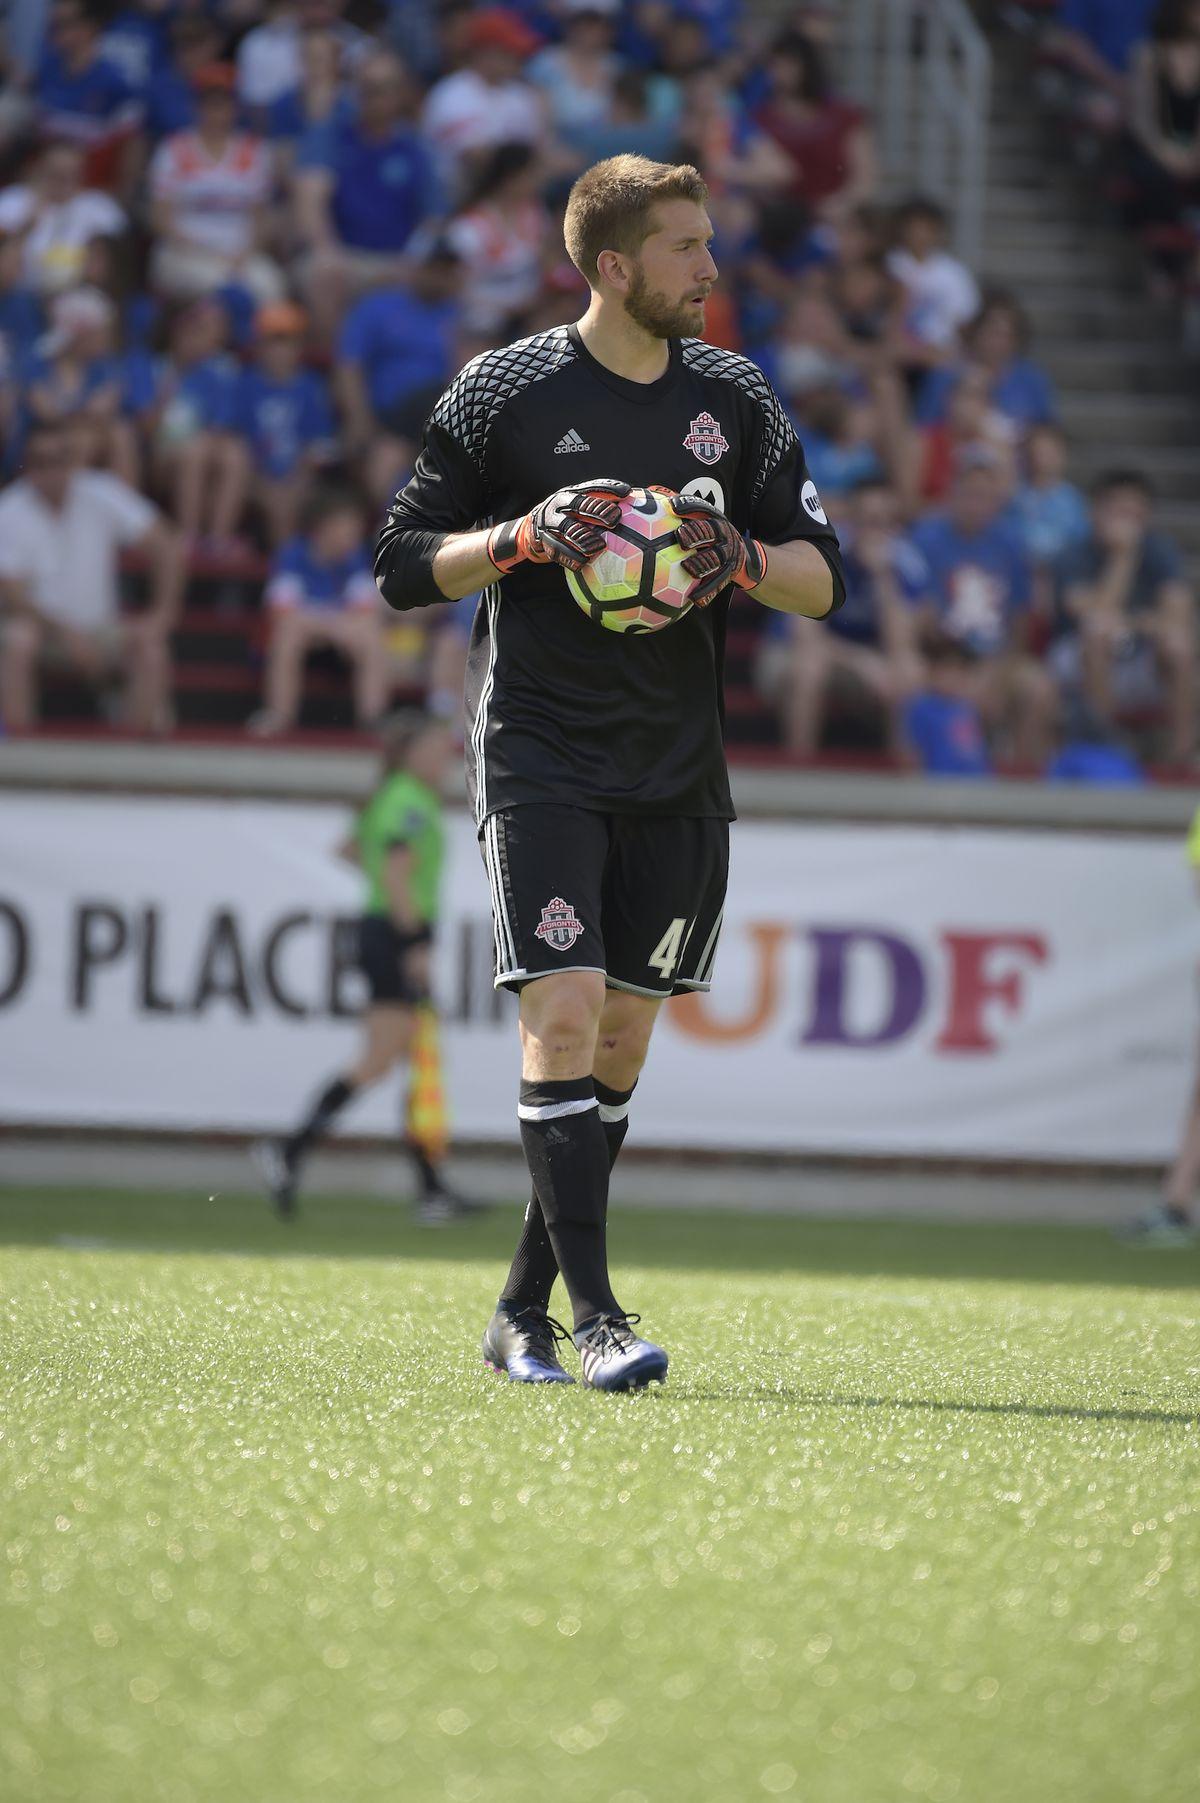 USL Photo - TFC II goalkeeper Mark Pais looks to restart play in Cincinnati